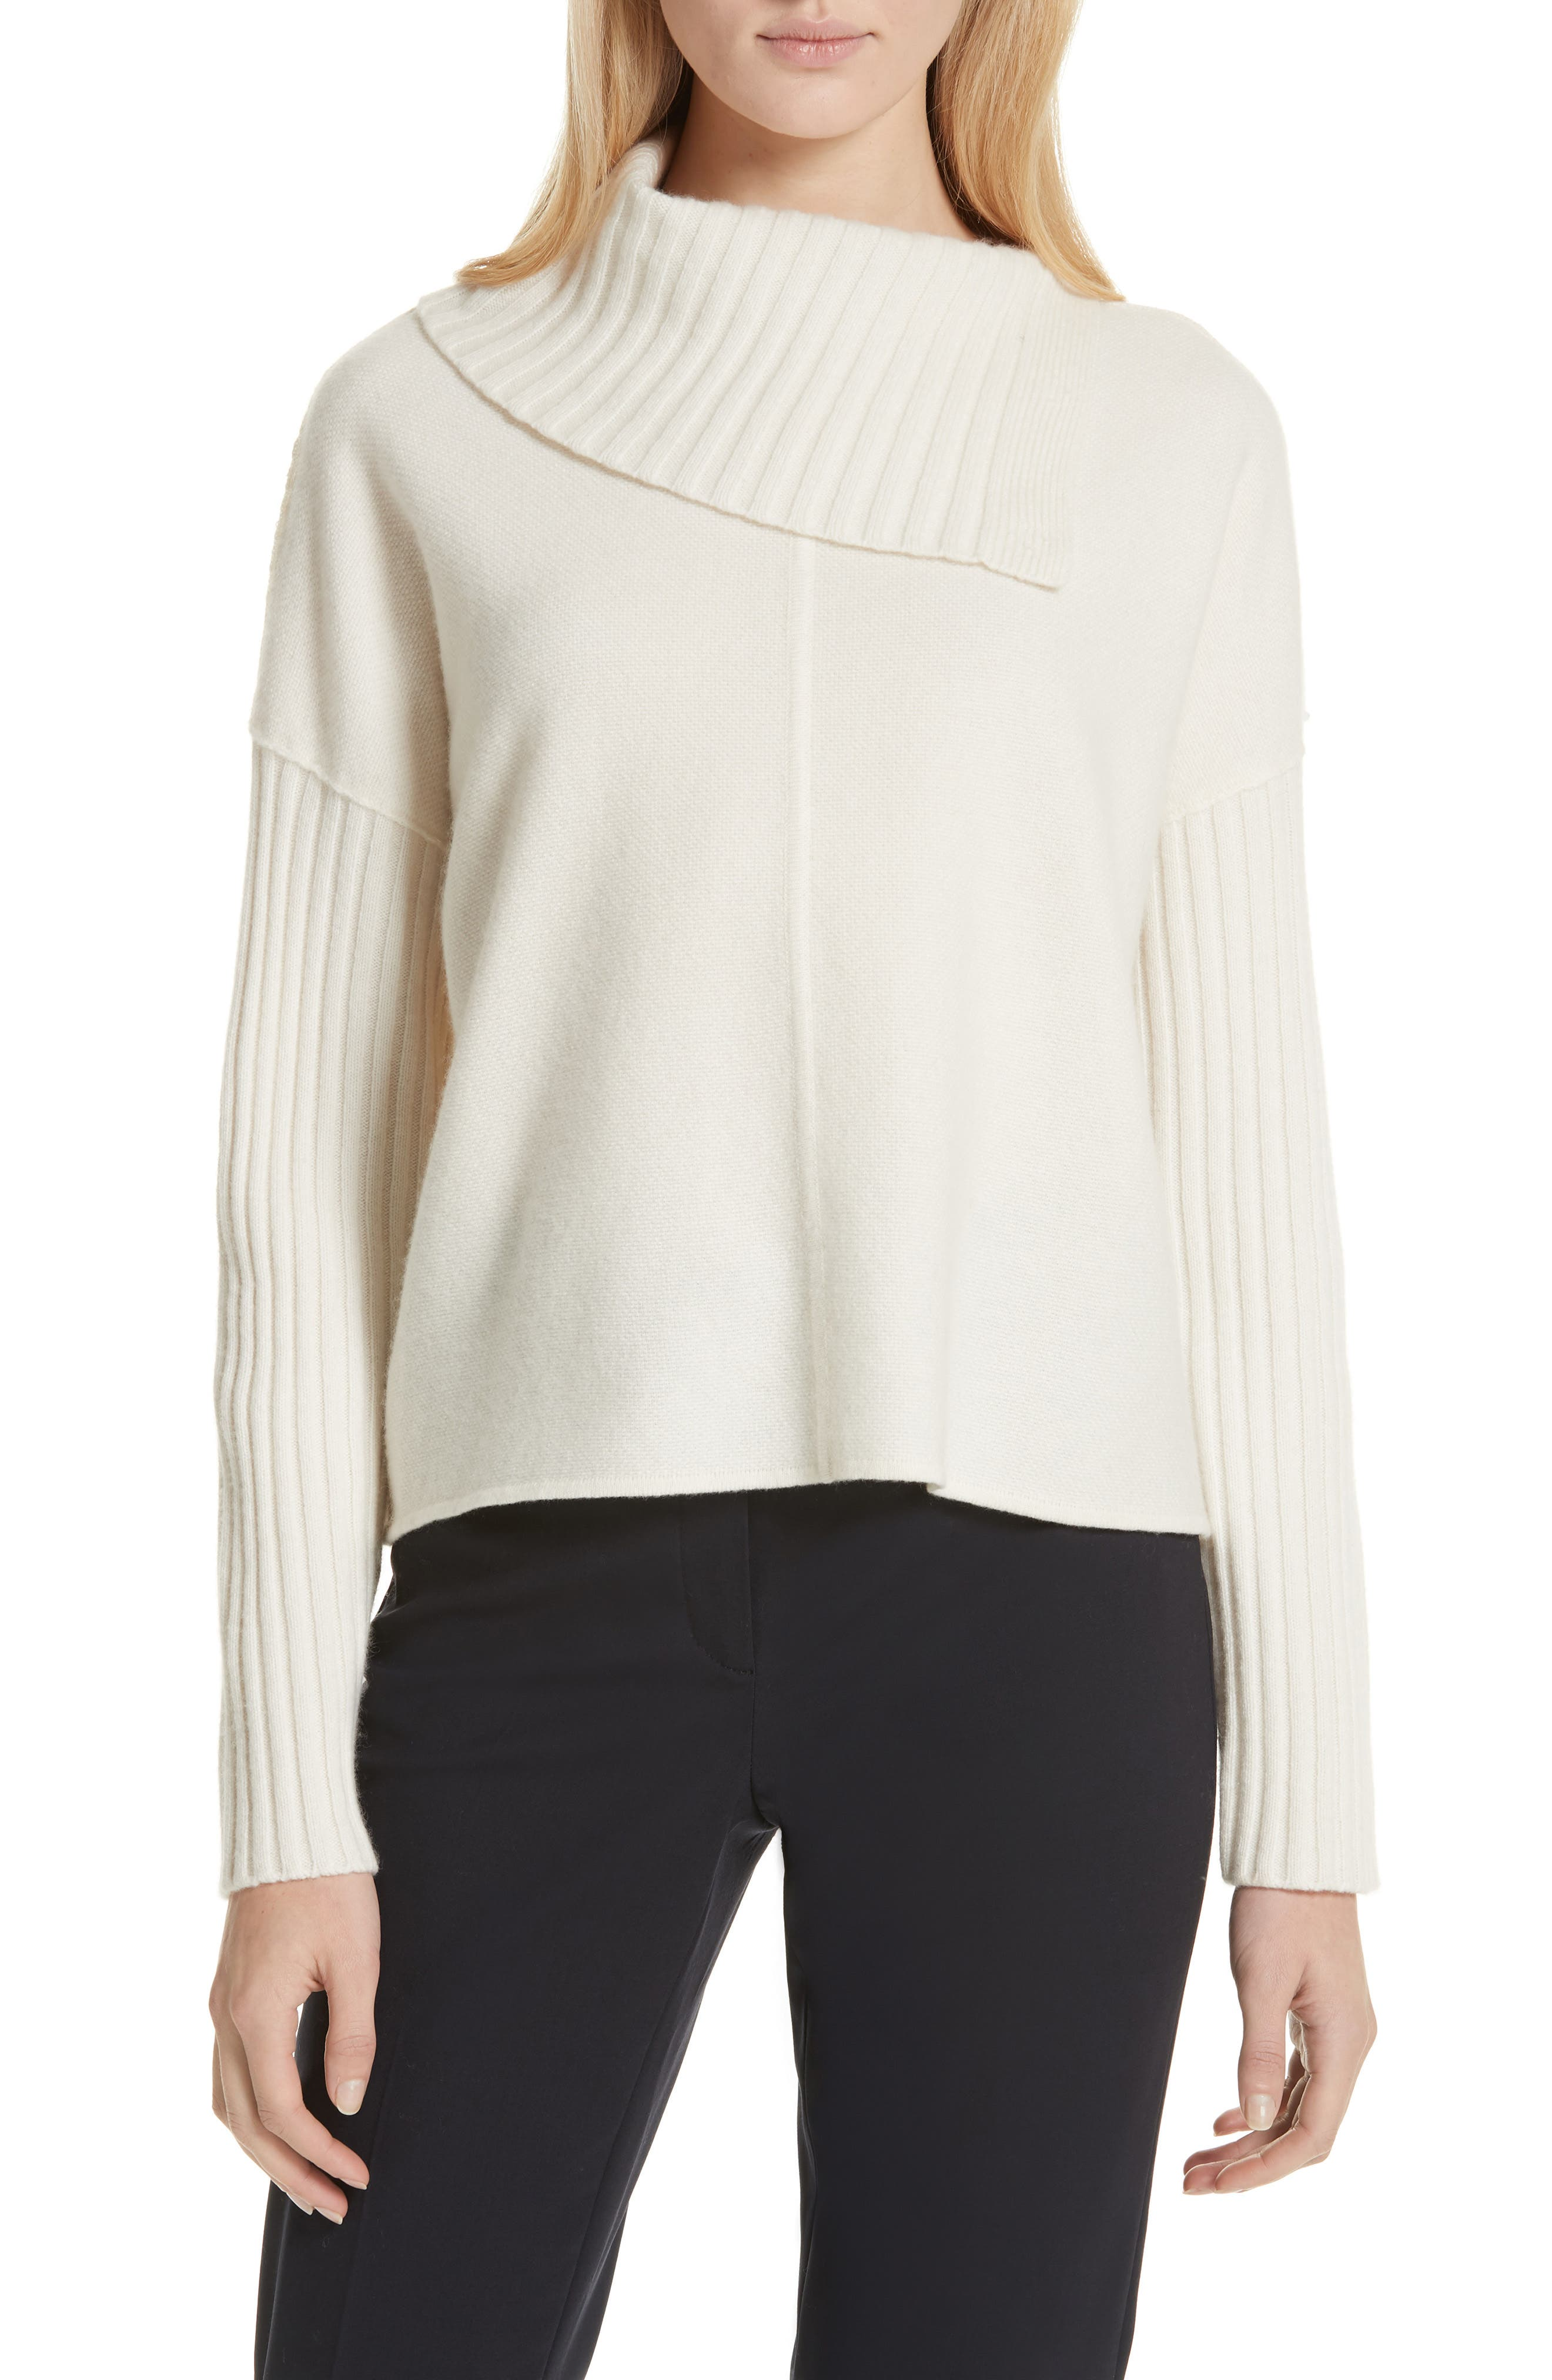 Nordstrom Signature Split Turtleneck Cashmere Sweater, Ivory